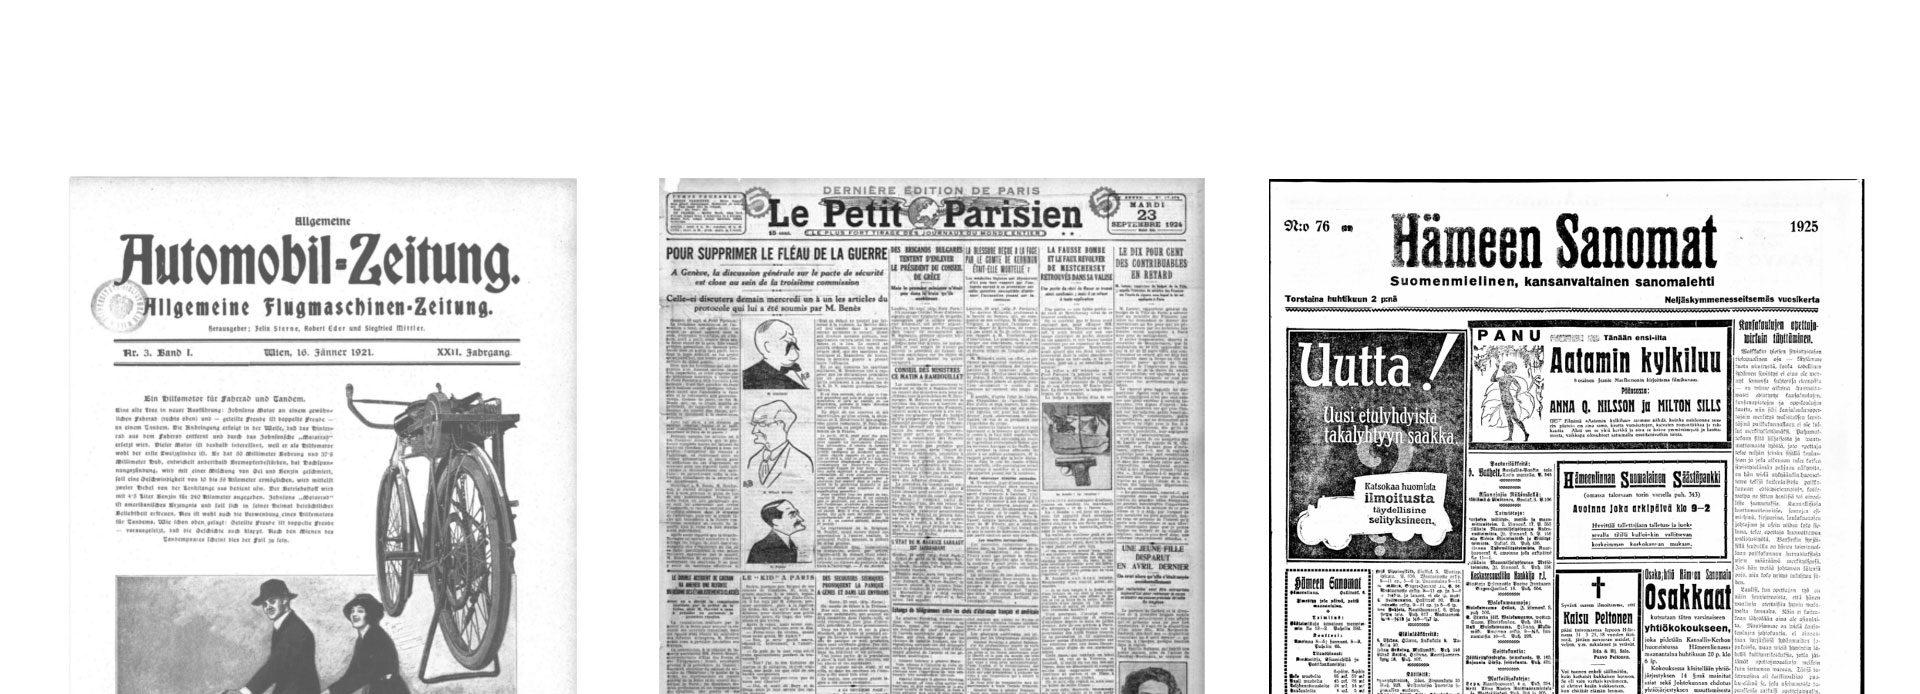 Image of old newspaper journals